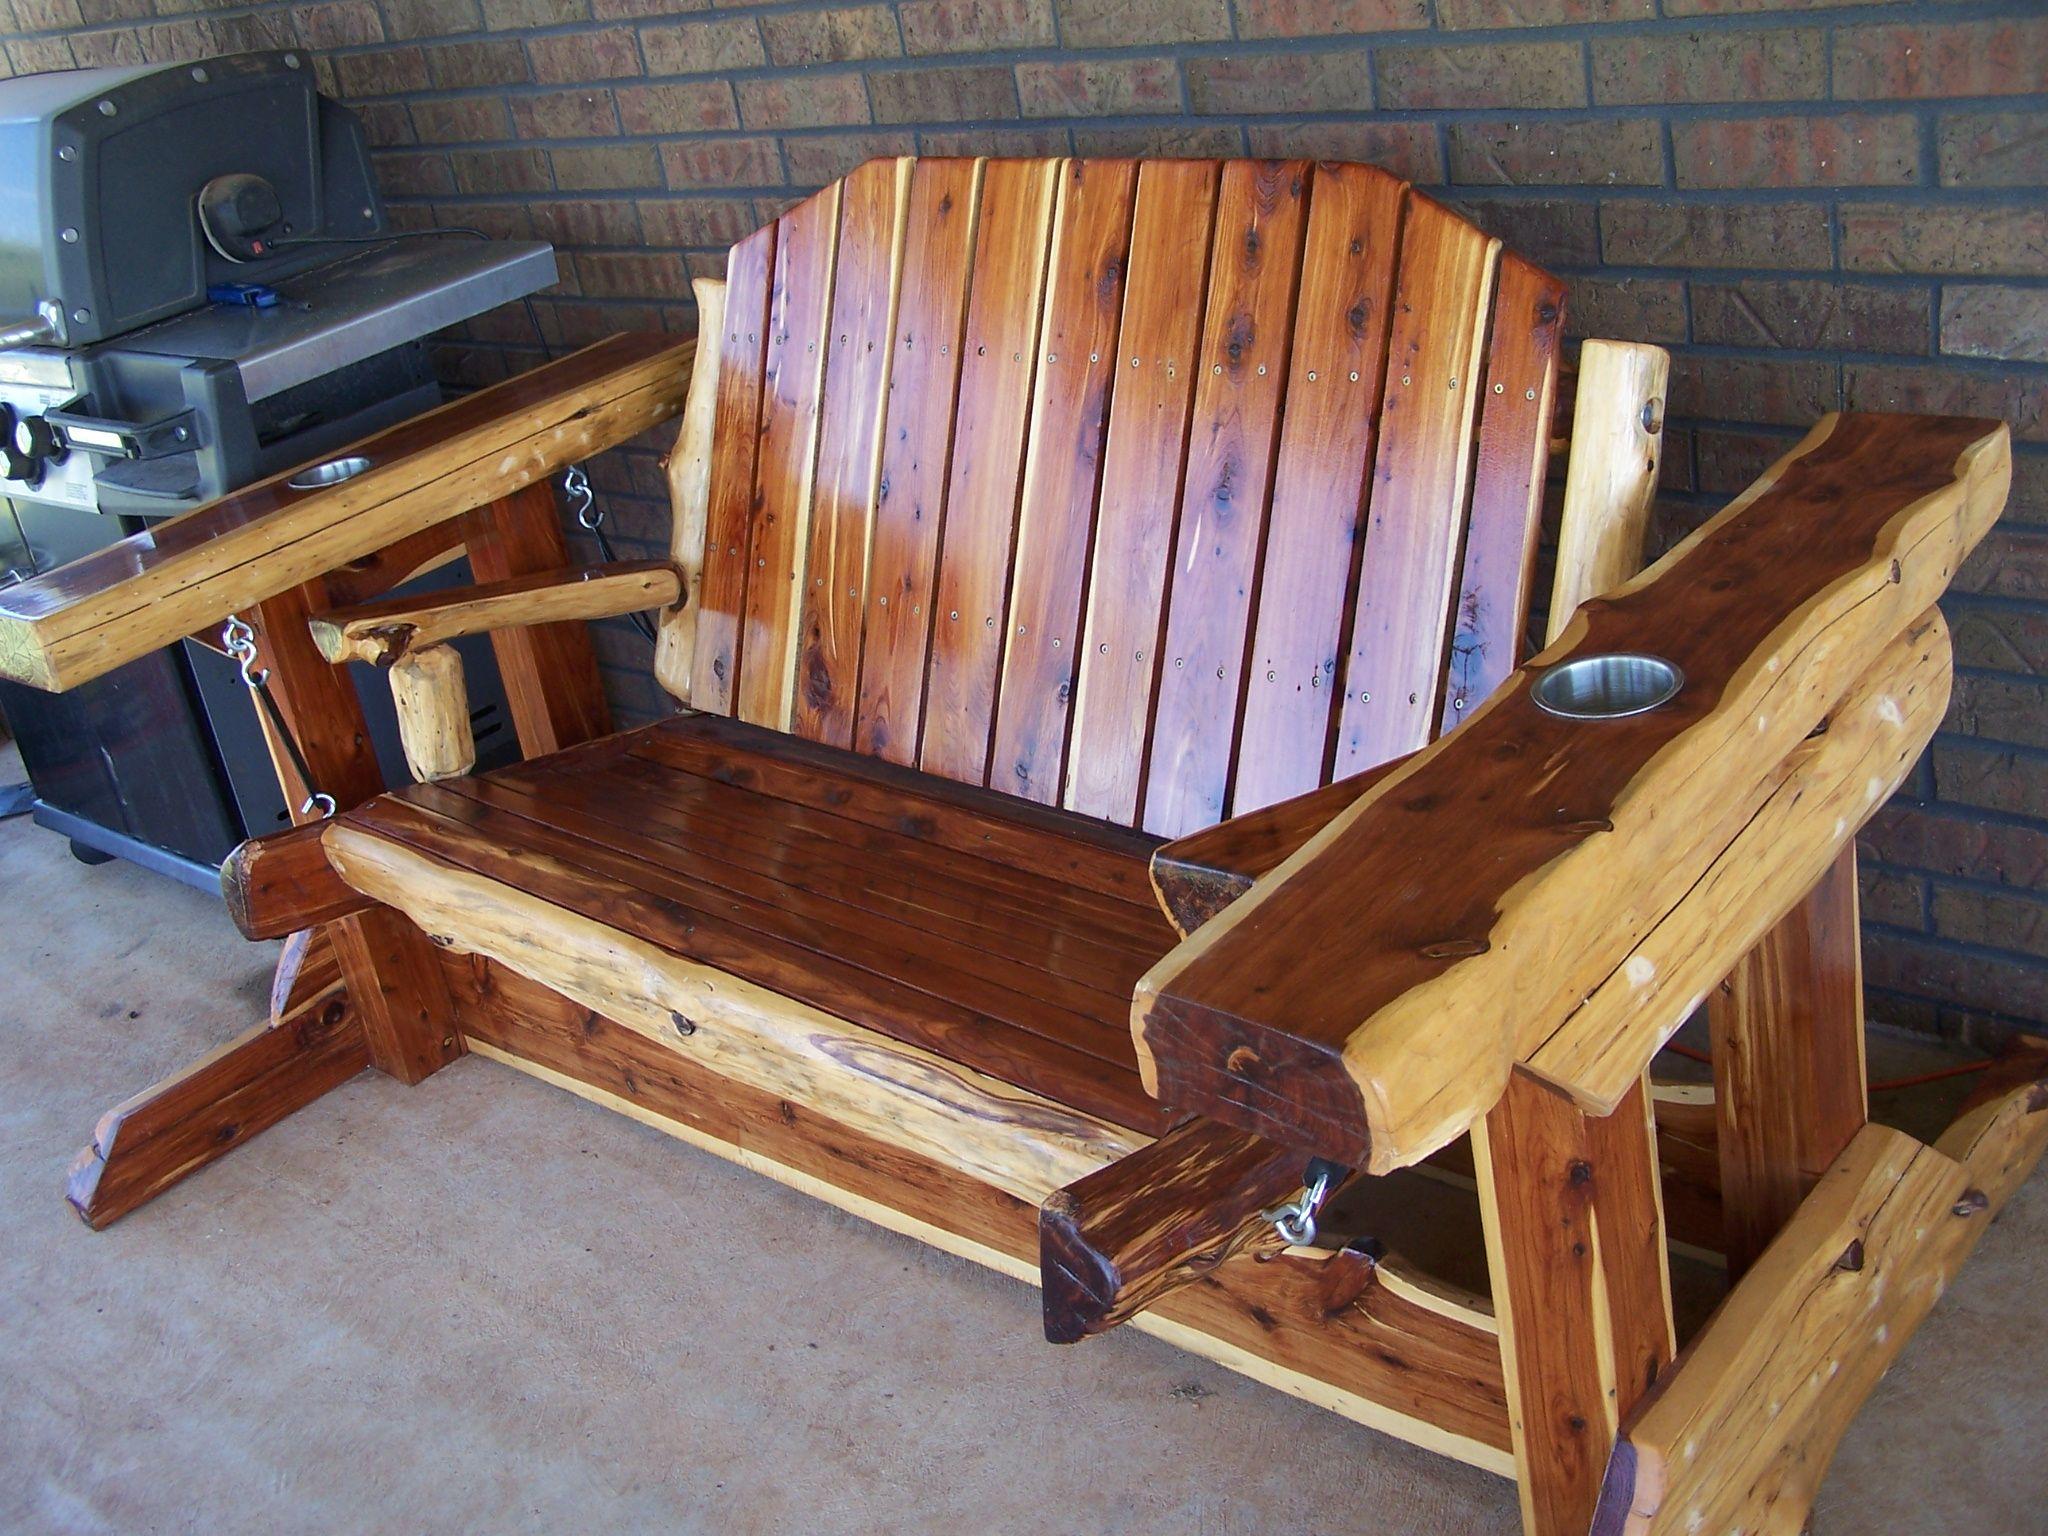 Custom Made Rustic Cedar Glider Swing By Wild West Creations Custommade Com